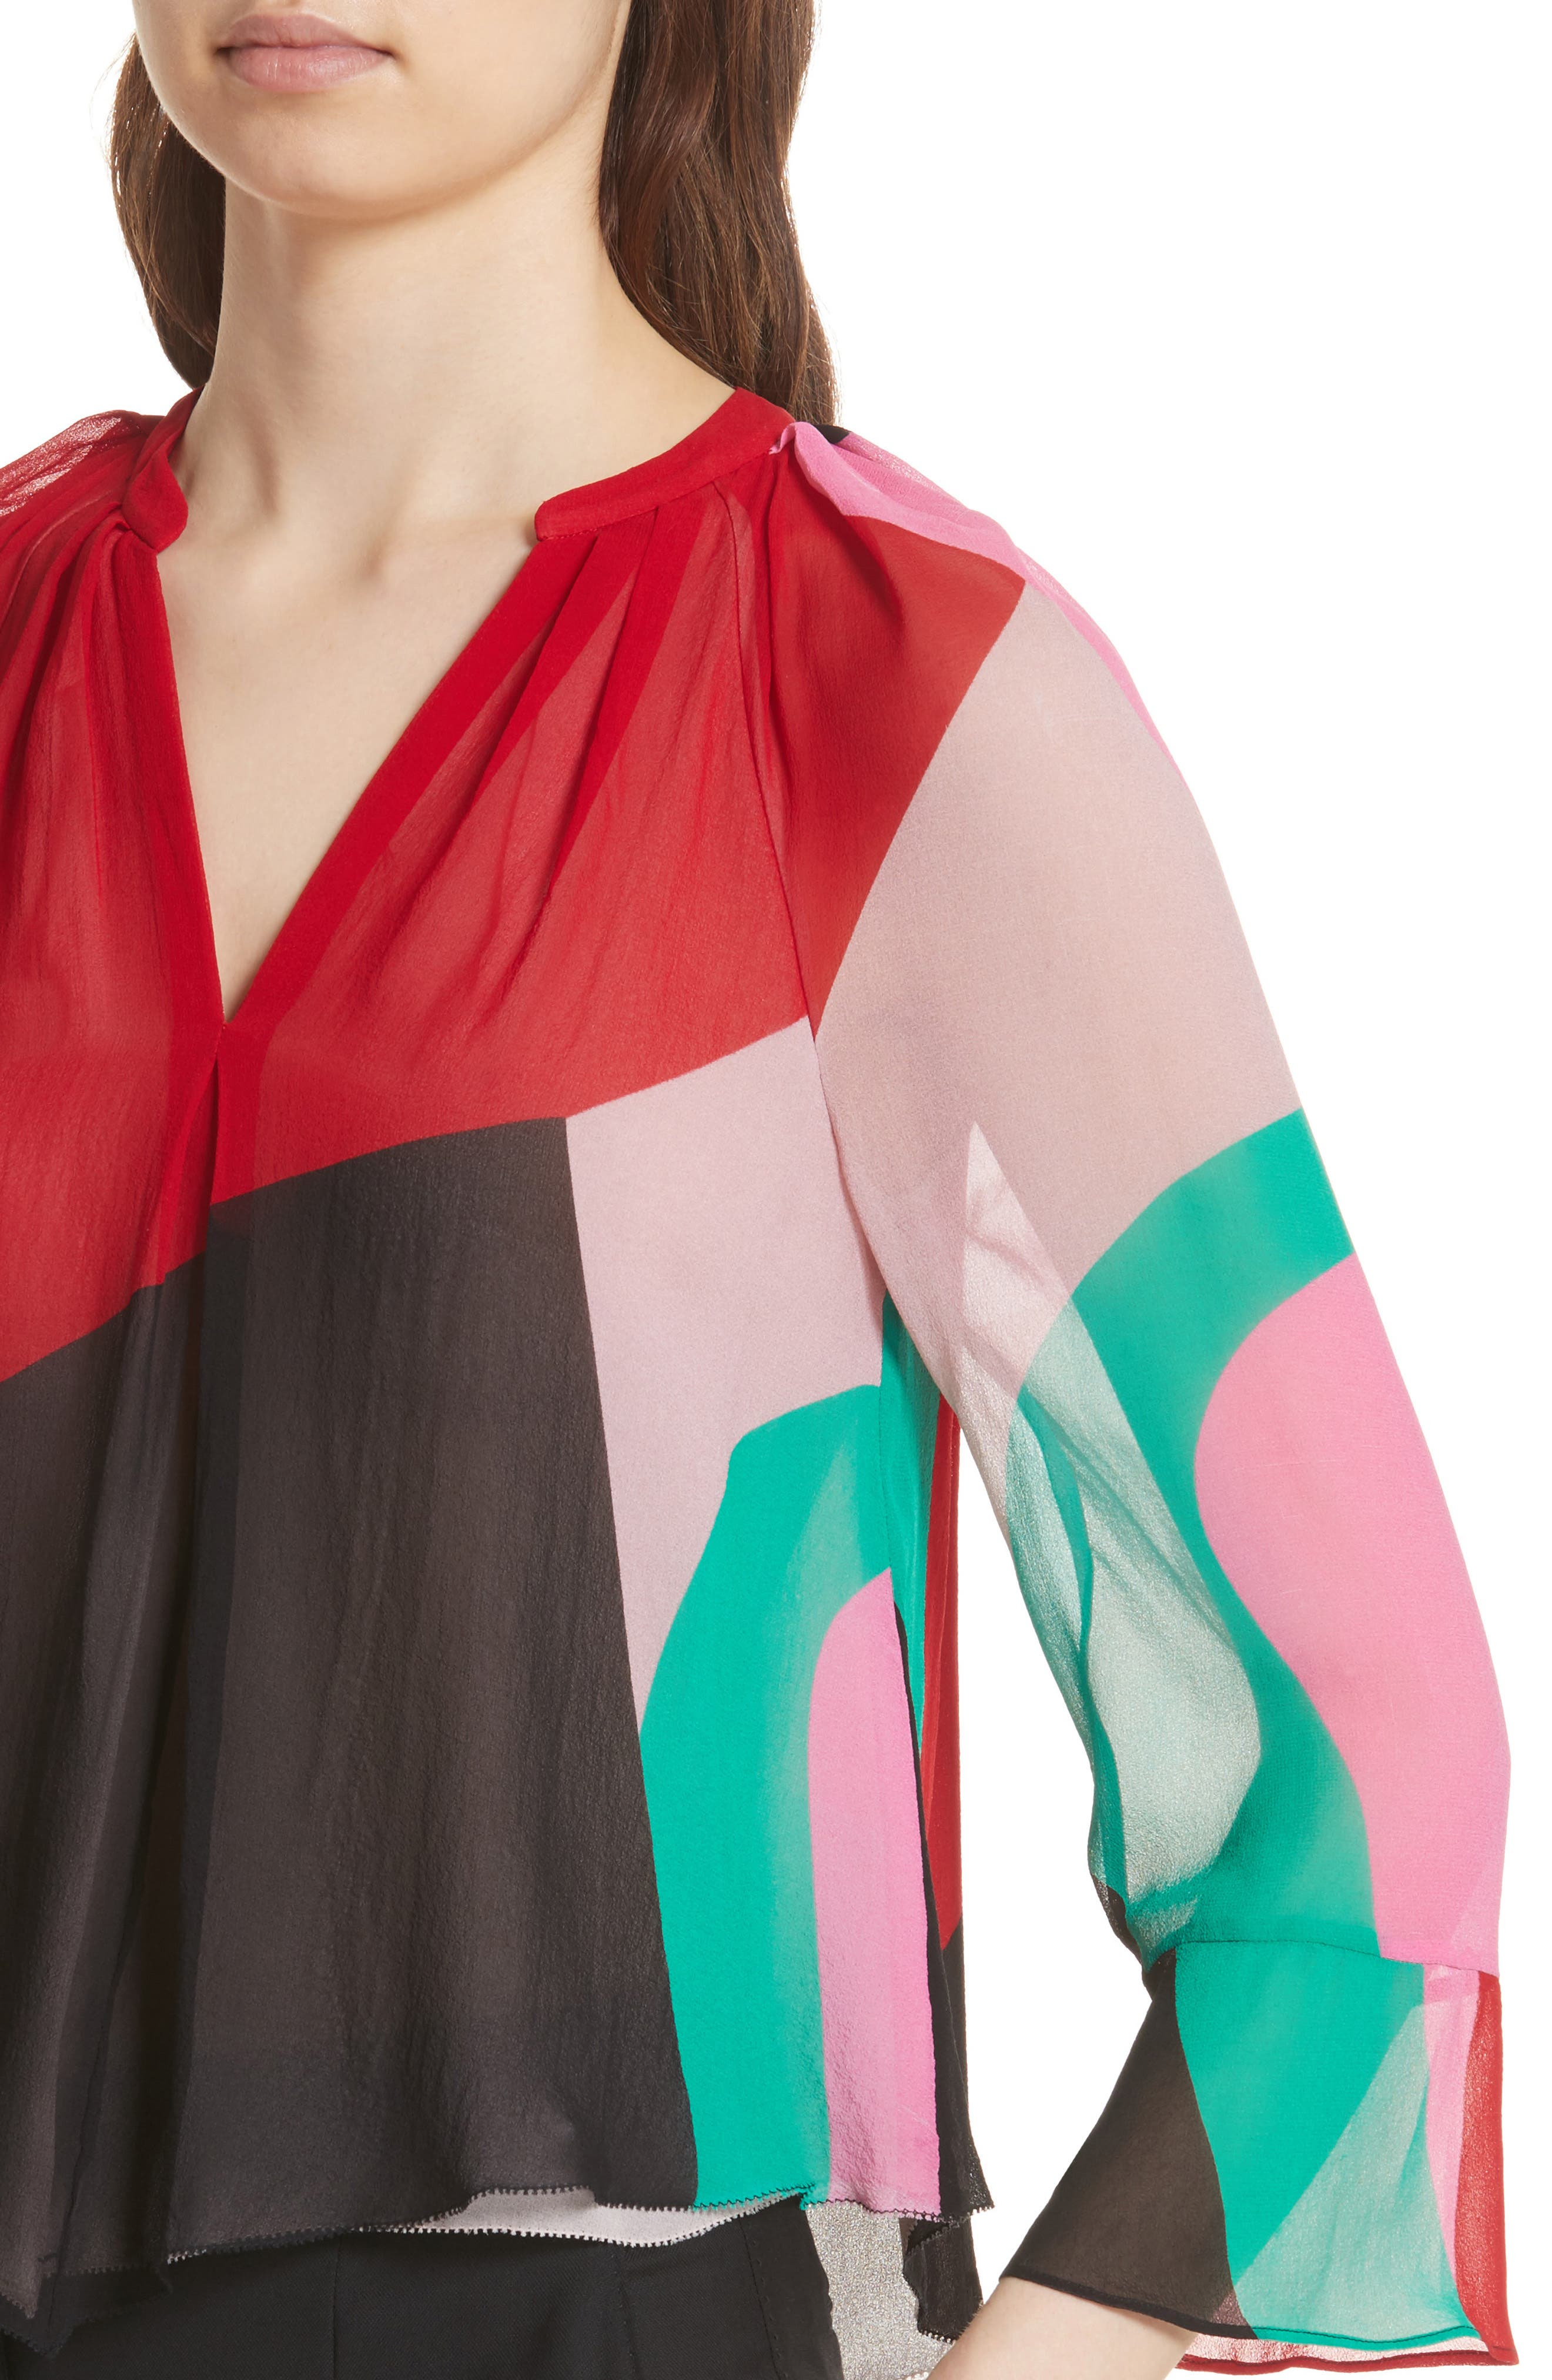 Quinlynn Colorblock Silk Top,                             Alternate thumbnail 4, color,                             Multi